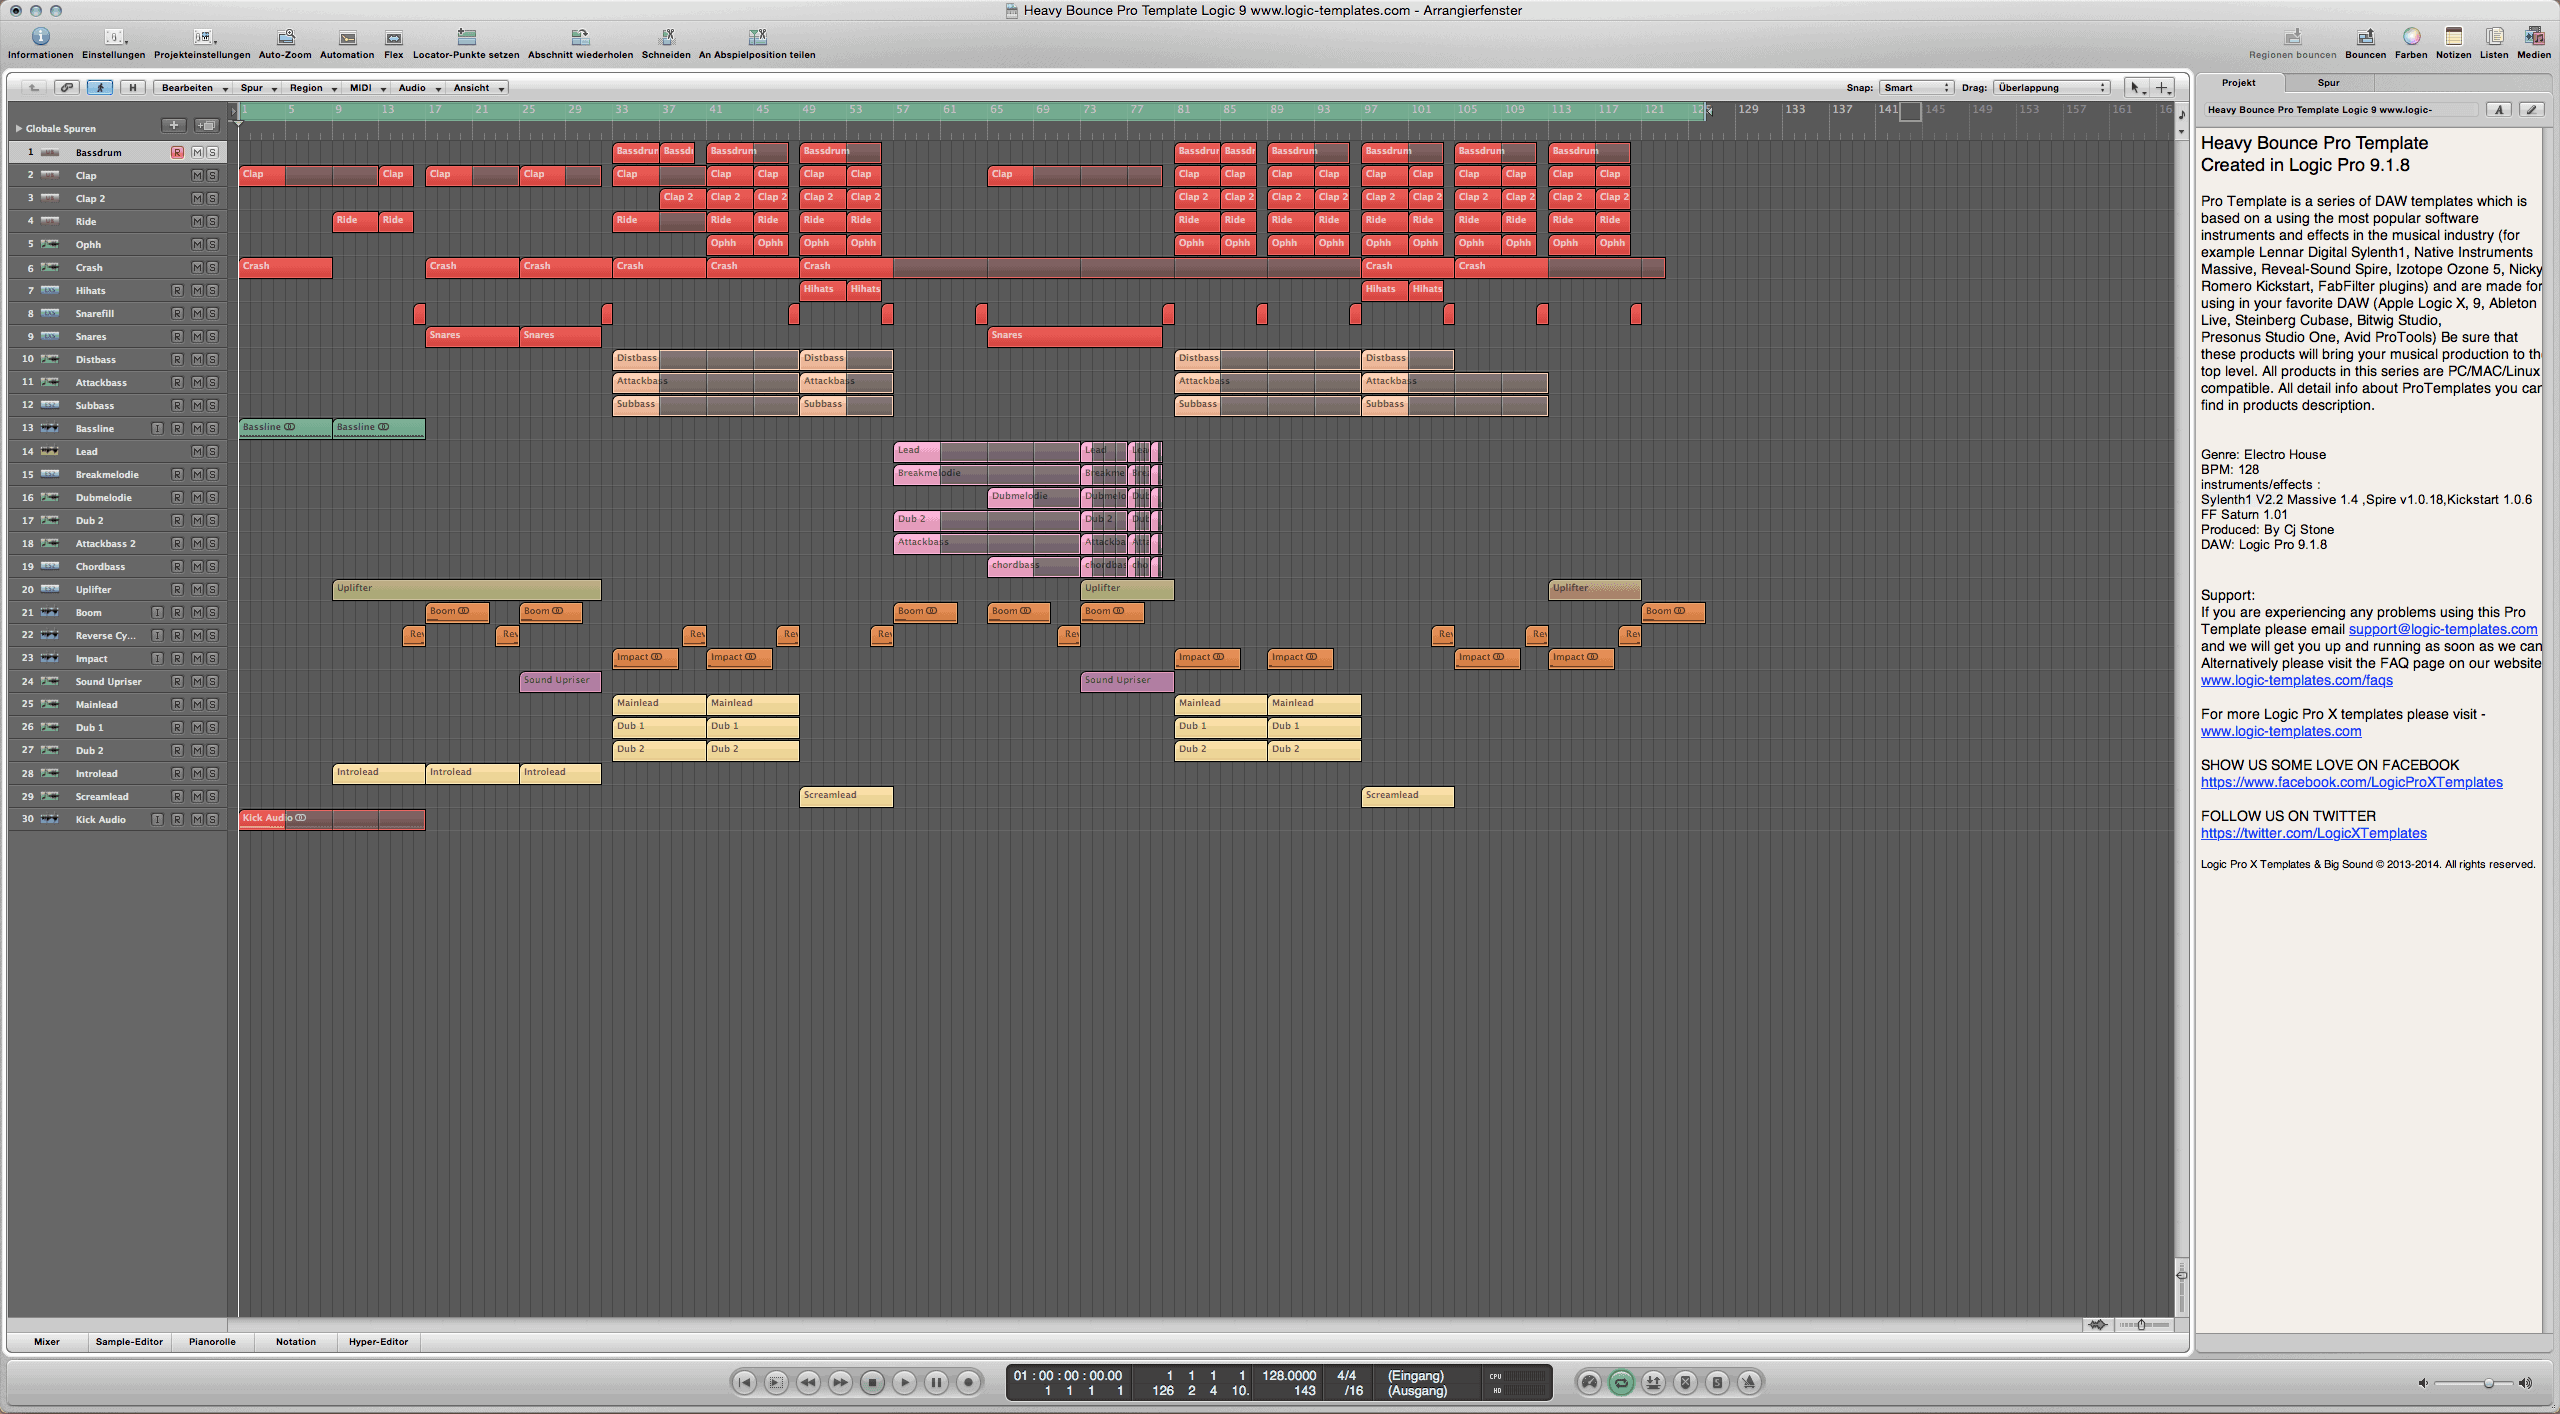 Heavy Bounce Pro Template Logic 9 1